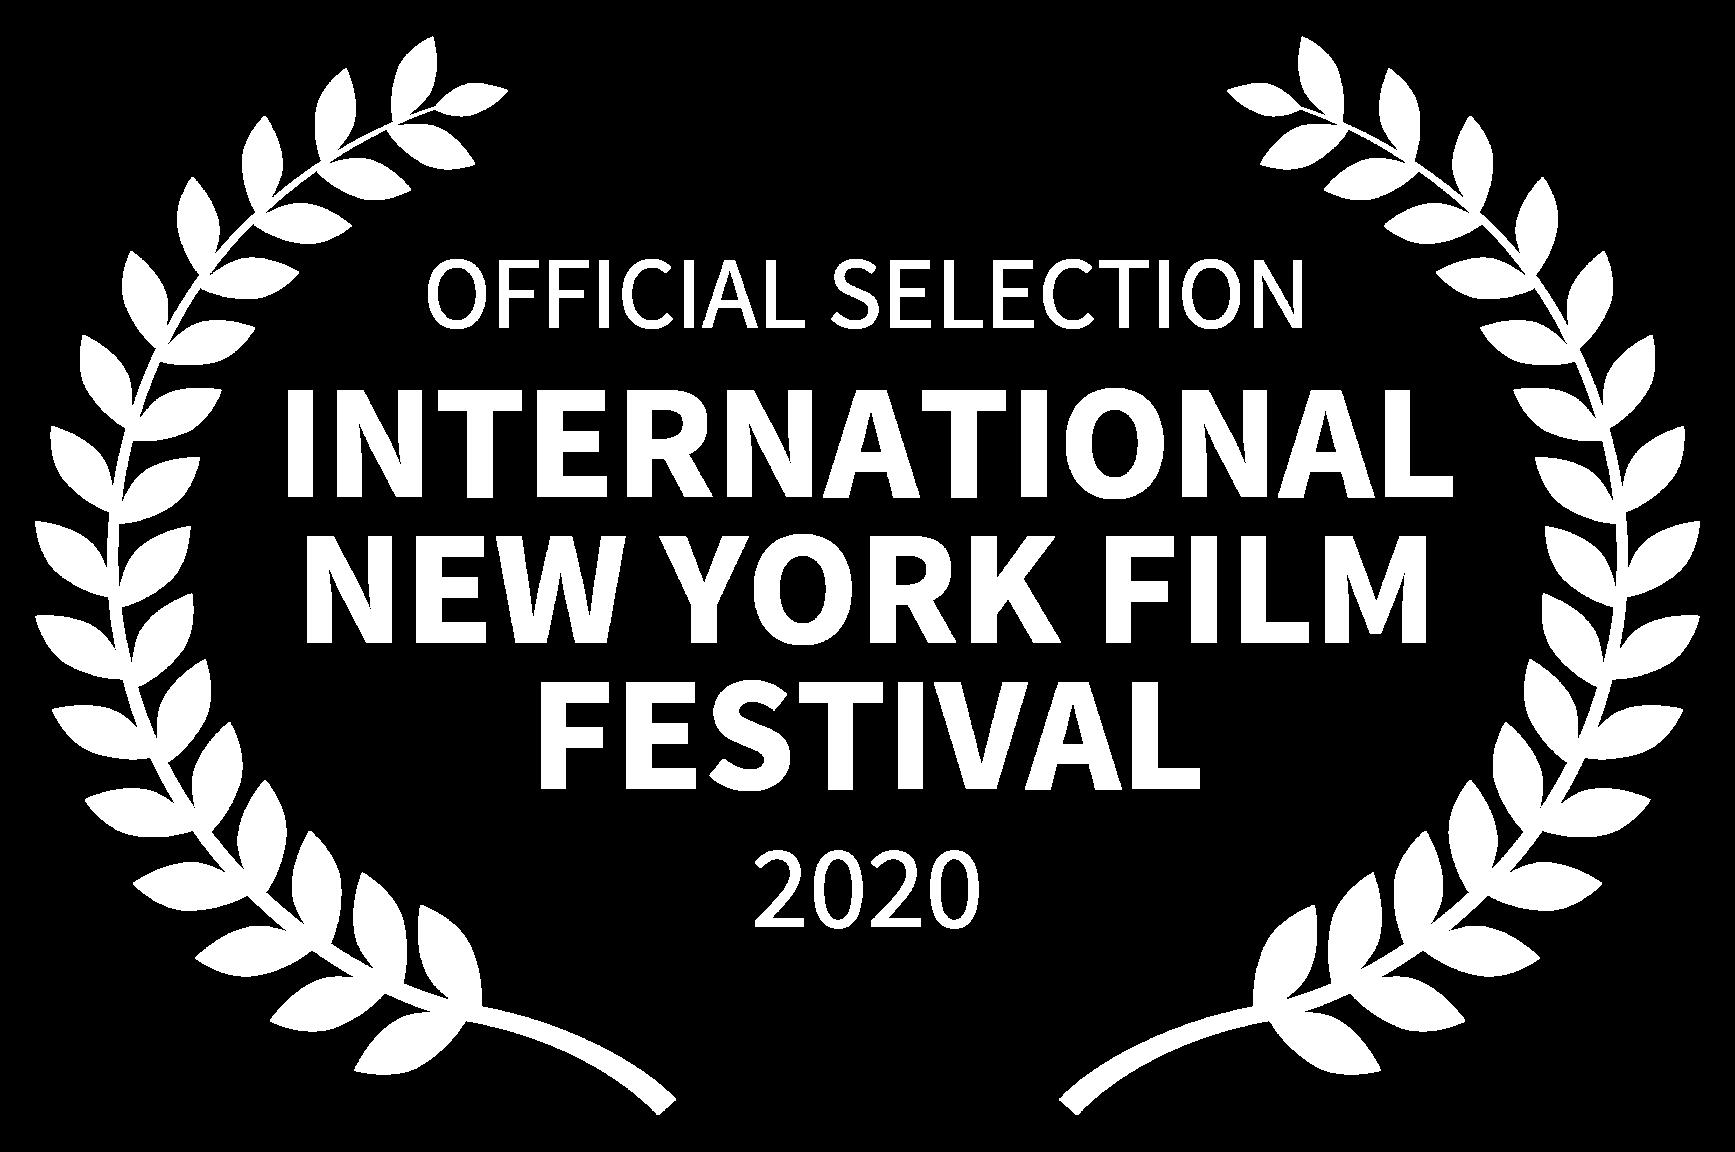 OFFICIAL SELECTION - INTERNATIONAL NEW YORK FILM FESTIVAL - 2020